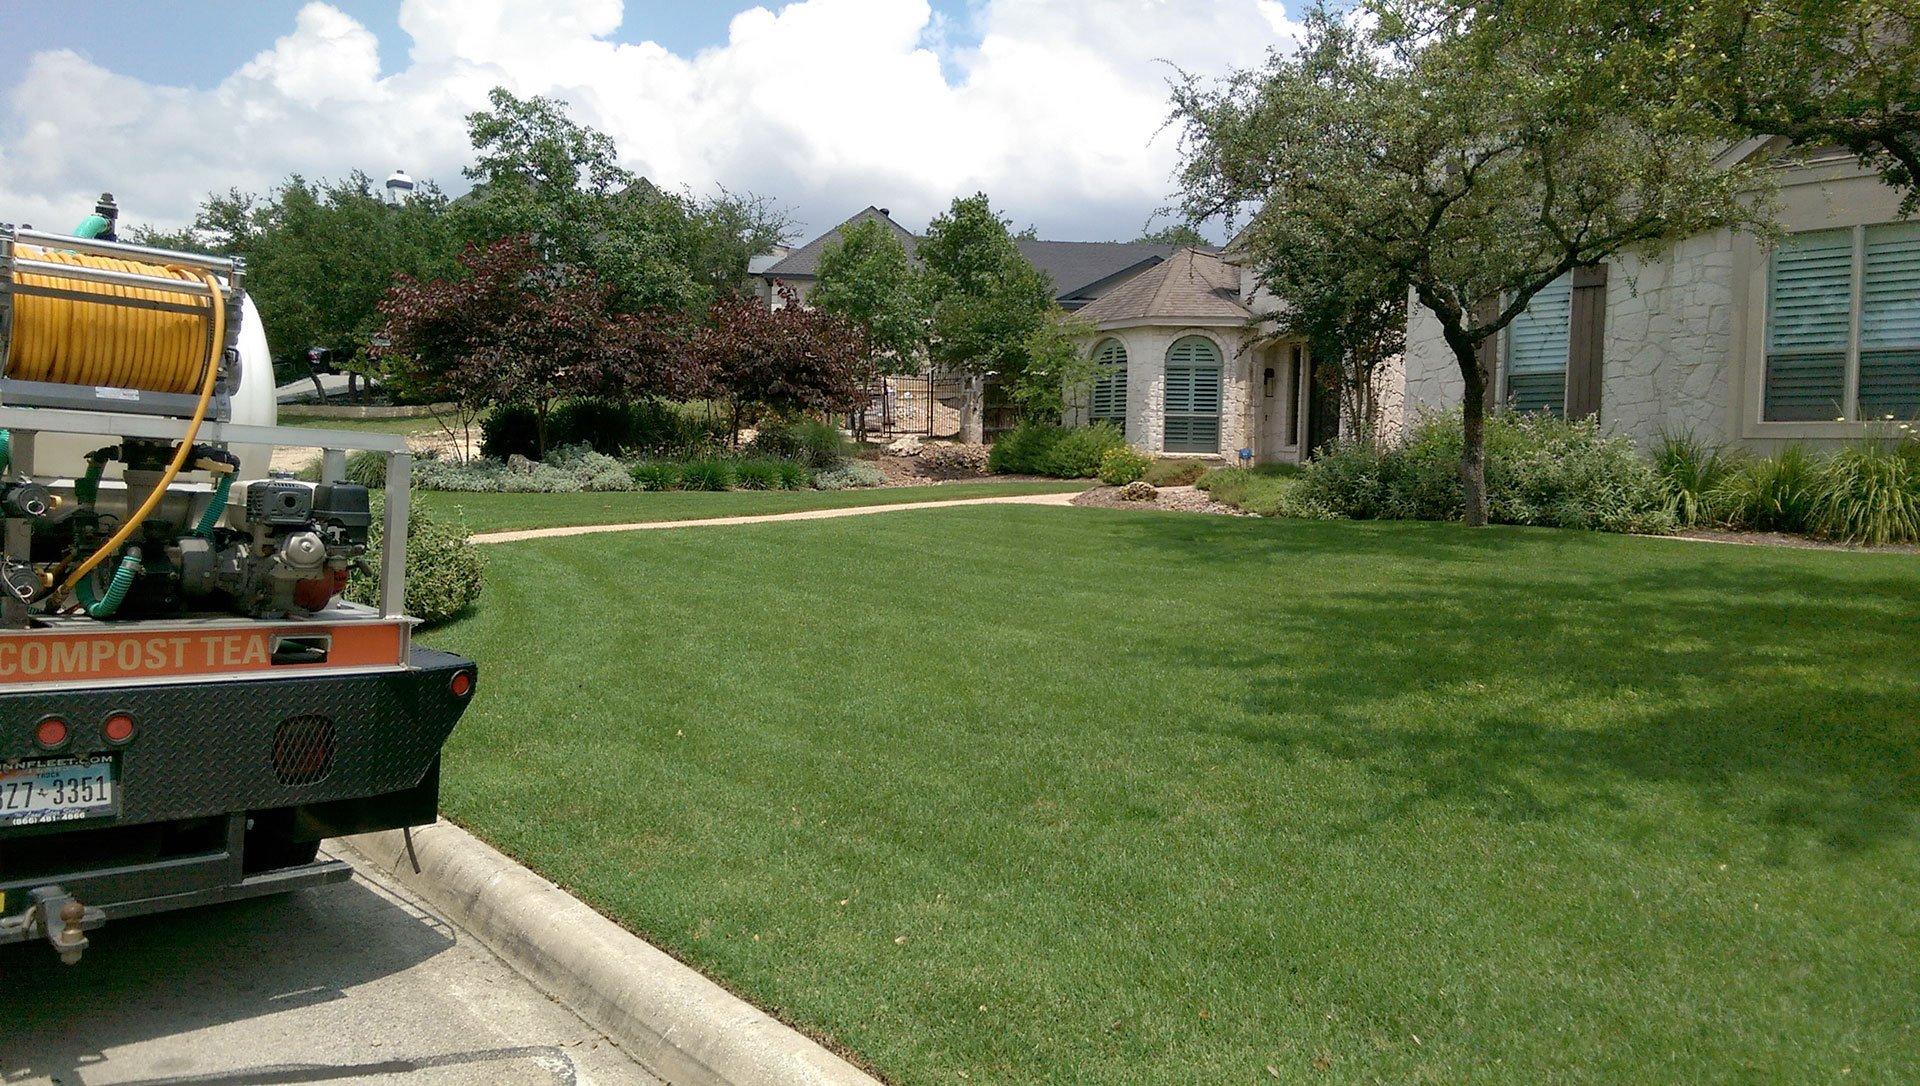 Organic Lawn Care San Antonio, TX